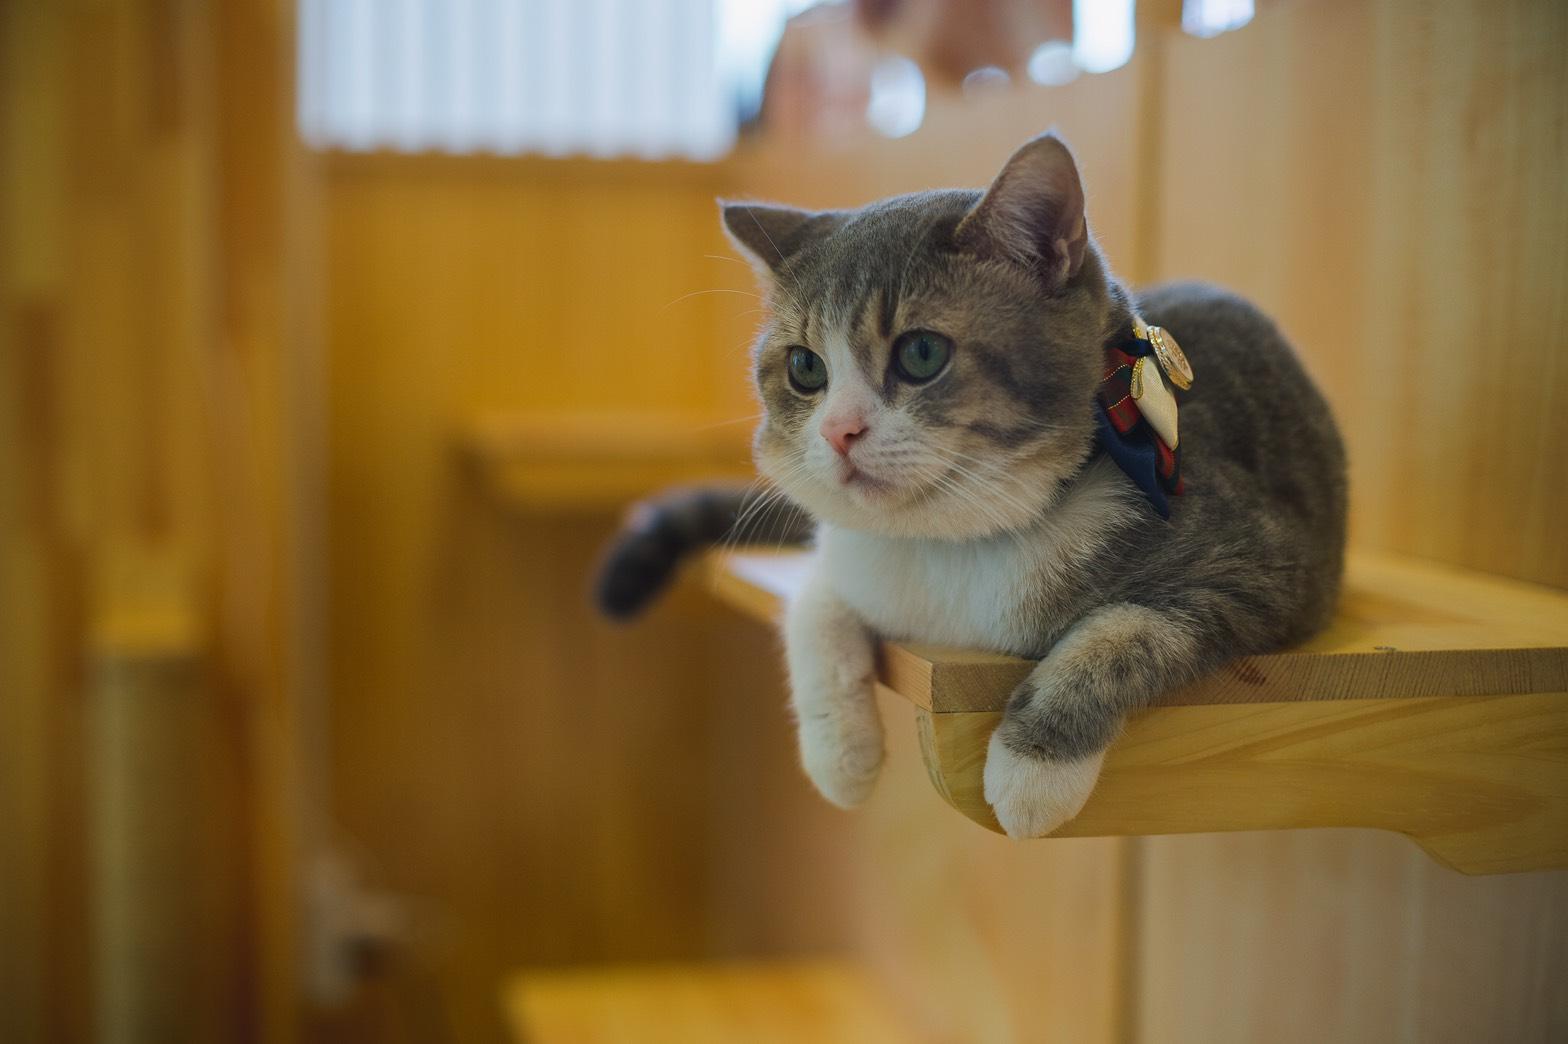 TRAIL and TAIL Pet-Friendly Community แหล่งแฮงค์เอ้าท์ใหม่ของคนเมือง พร้อมเติมความสุขให้สัตว์เลี้ยงแสนรักได้ทุกวัน 23 -